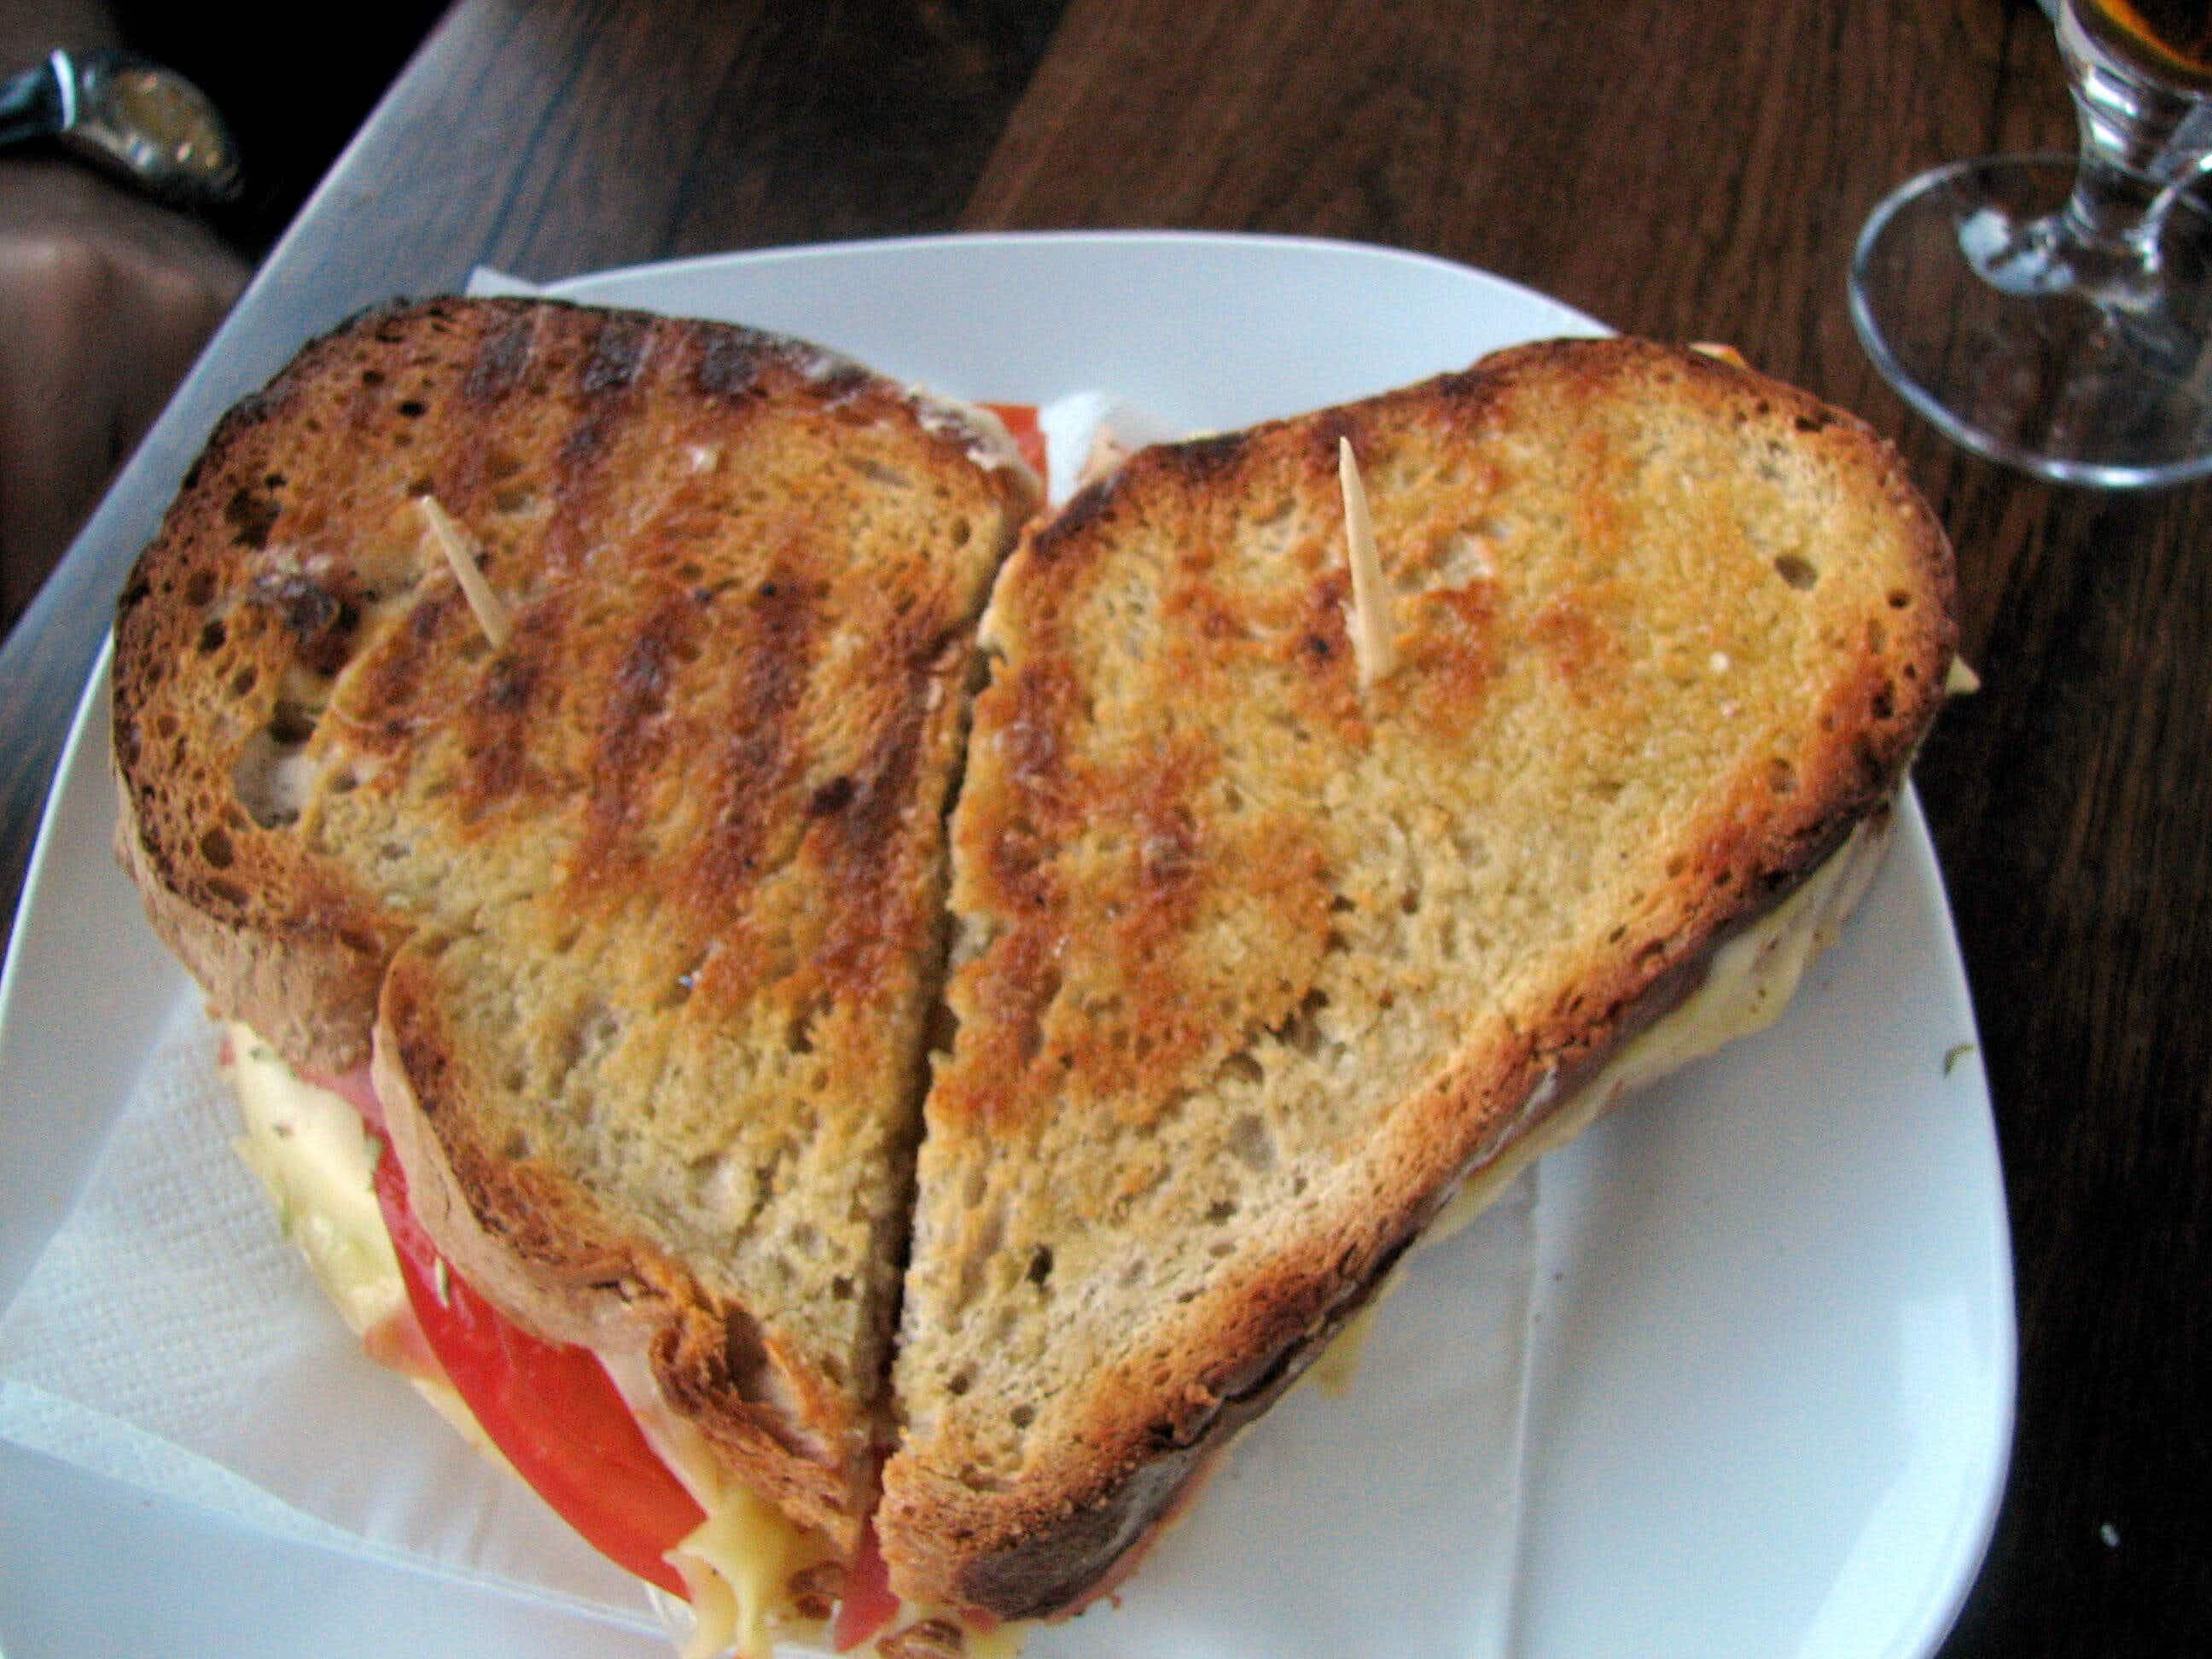 Ireland's Toastie Festival celebrates the cosy joy of toasted sandwiches